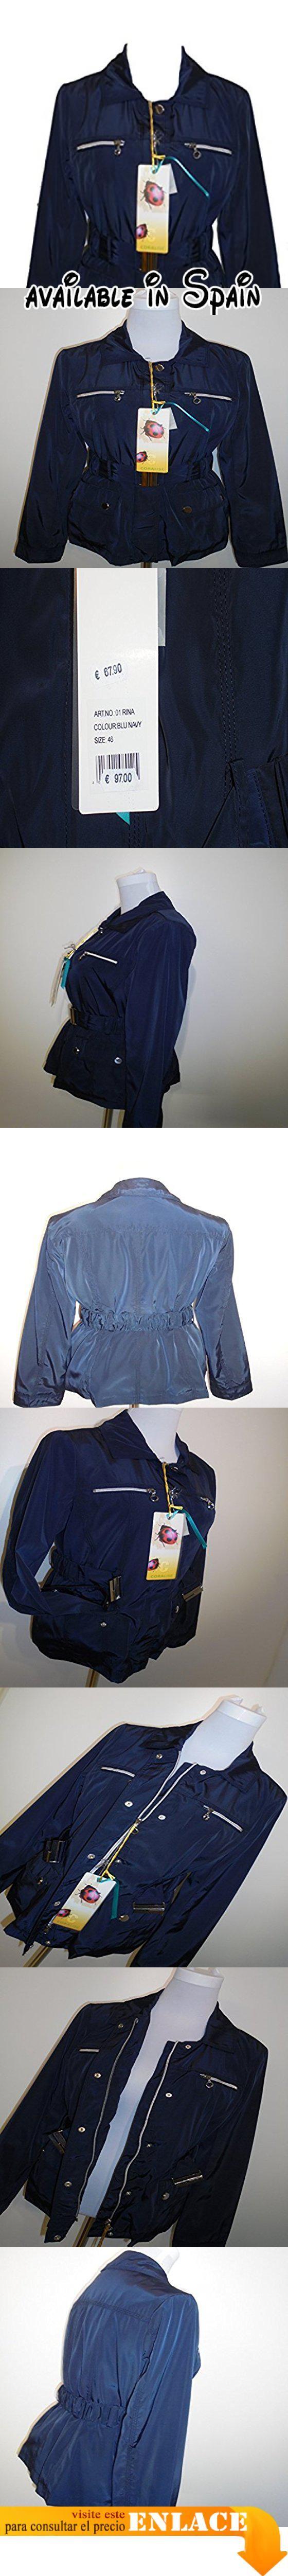 B015SWM8O0 : CORALISE - Abrigo impermeable - Manga larga - para mujer azul BLU NAVY Medium.